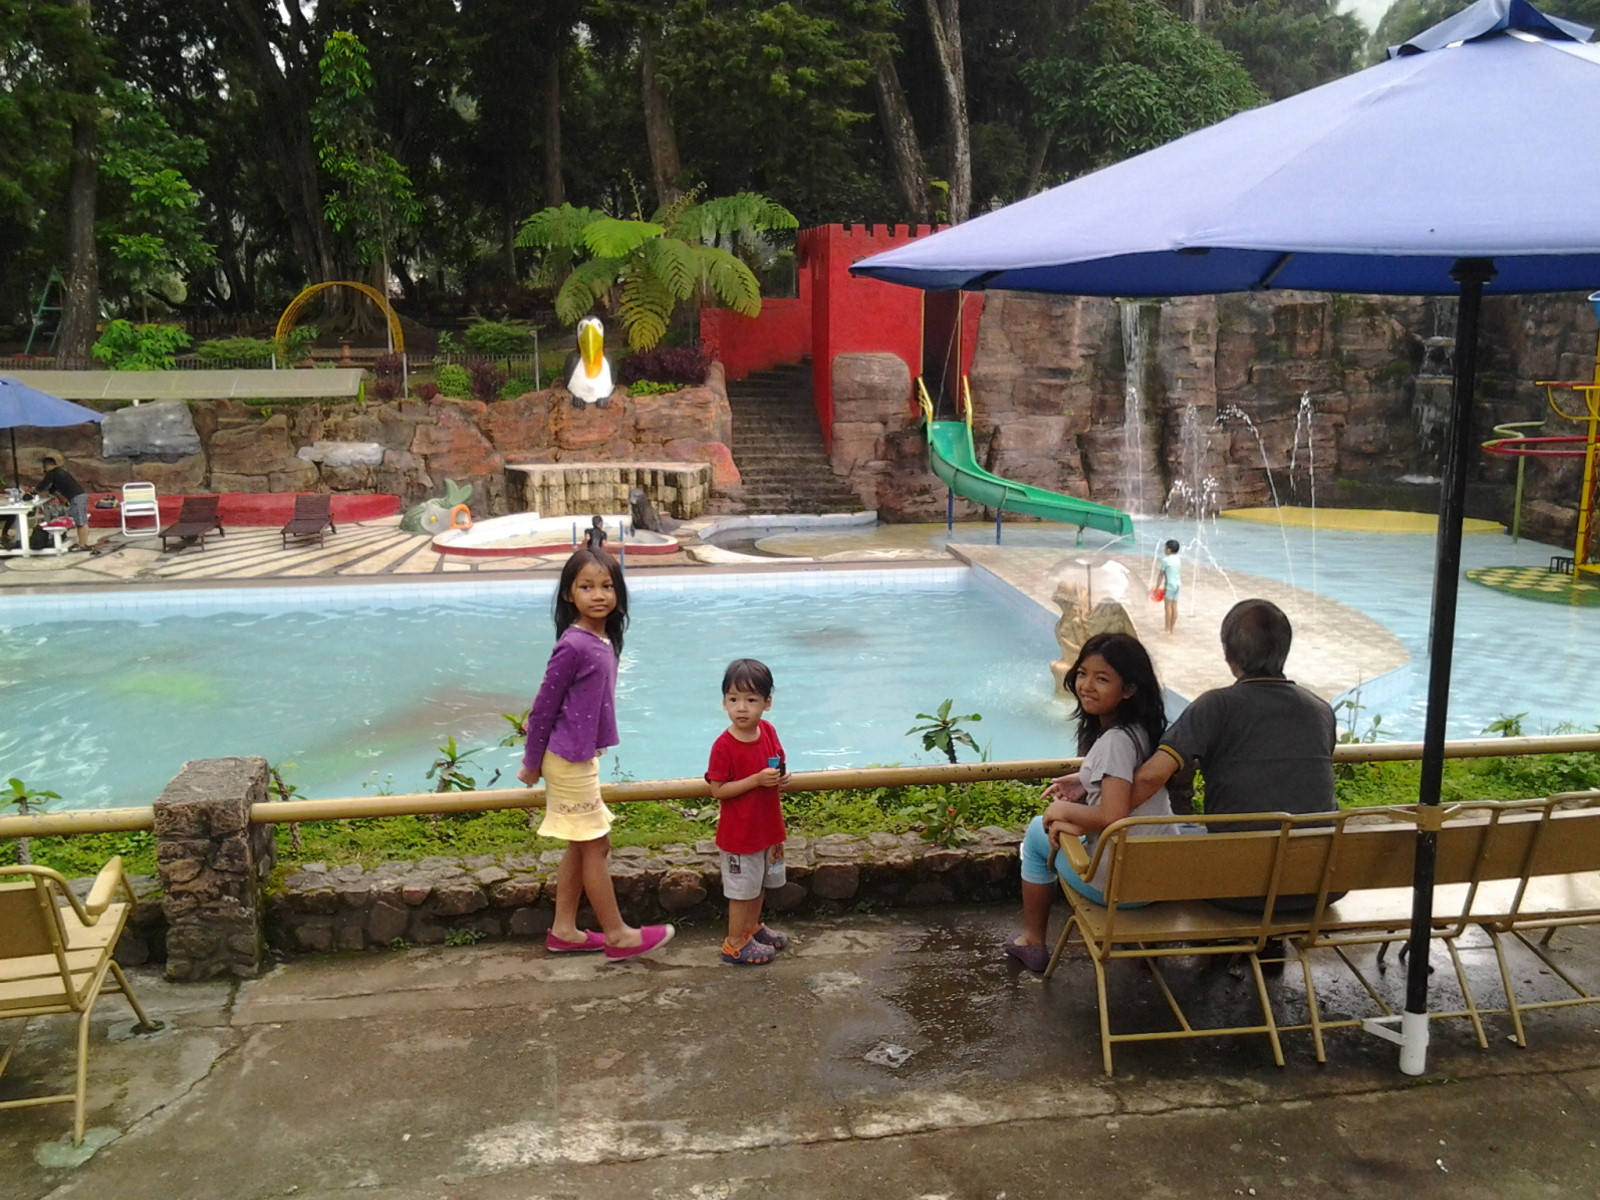 Holiday In Semarang Taman Wisata Kopeng Ketep Pass Smells Like